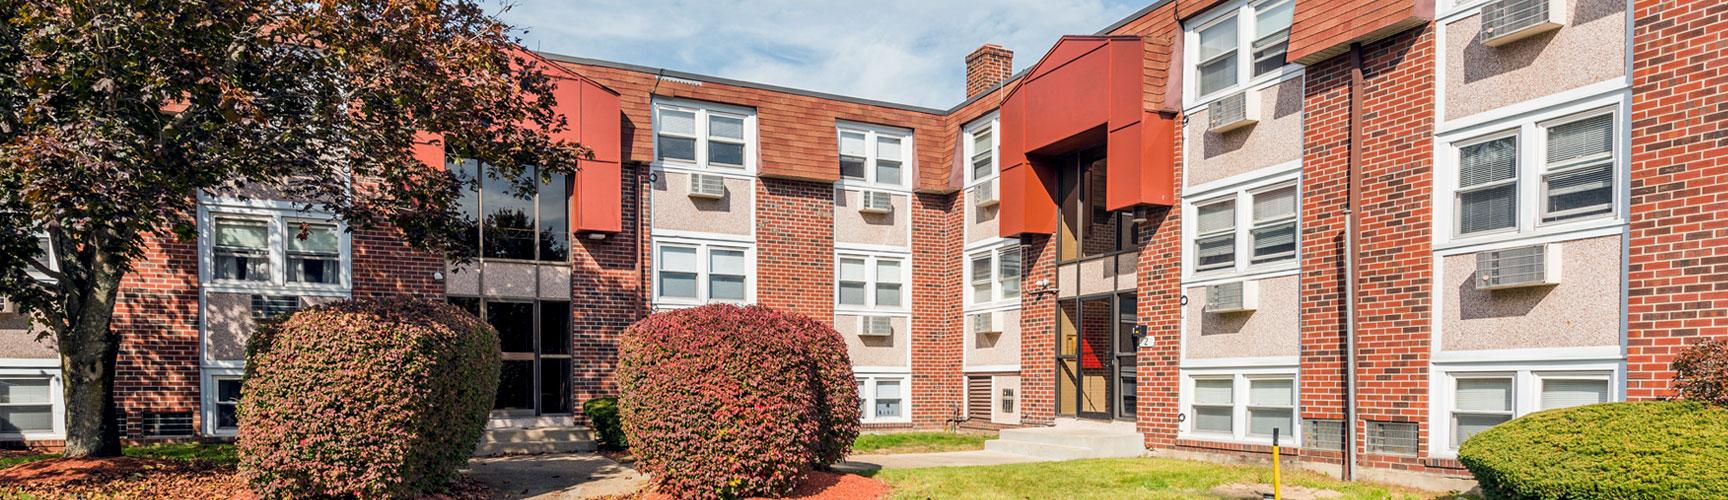 apartment-building-front